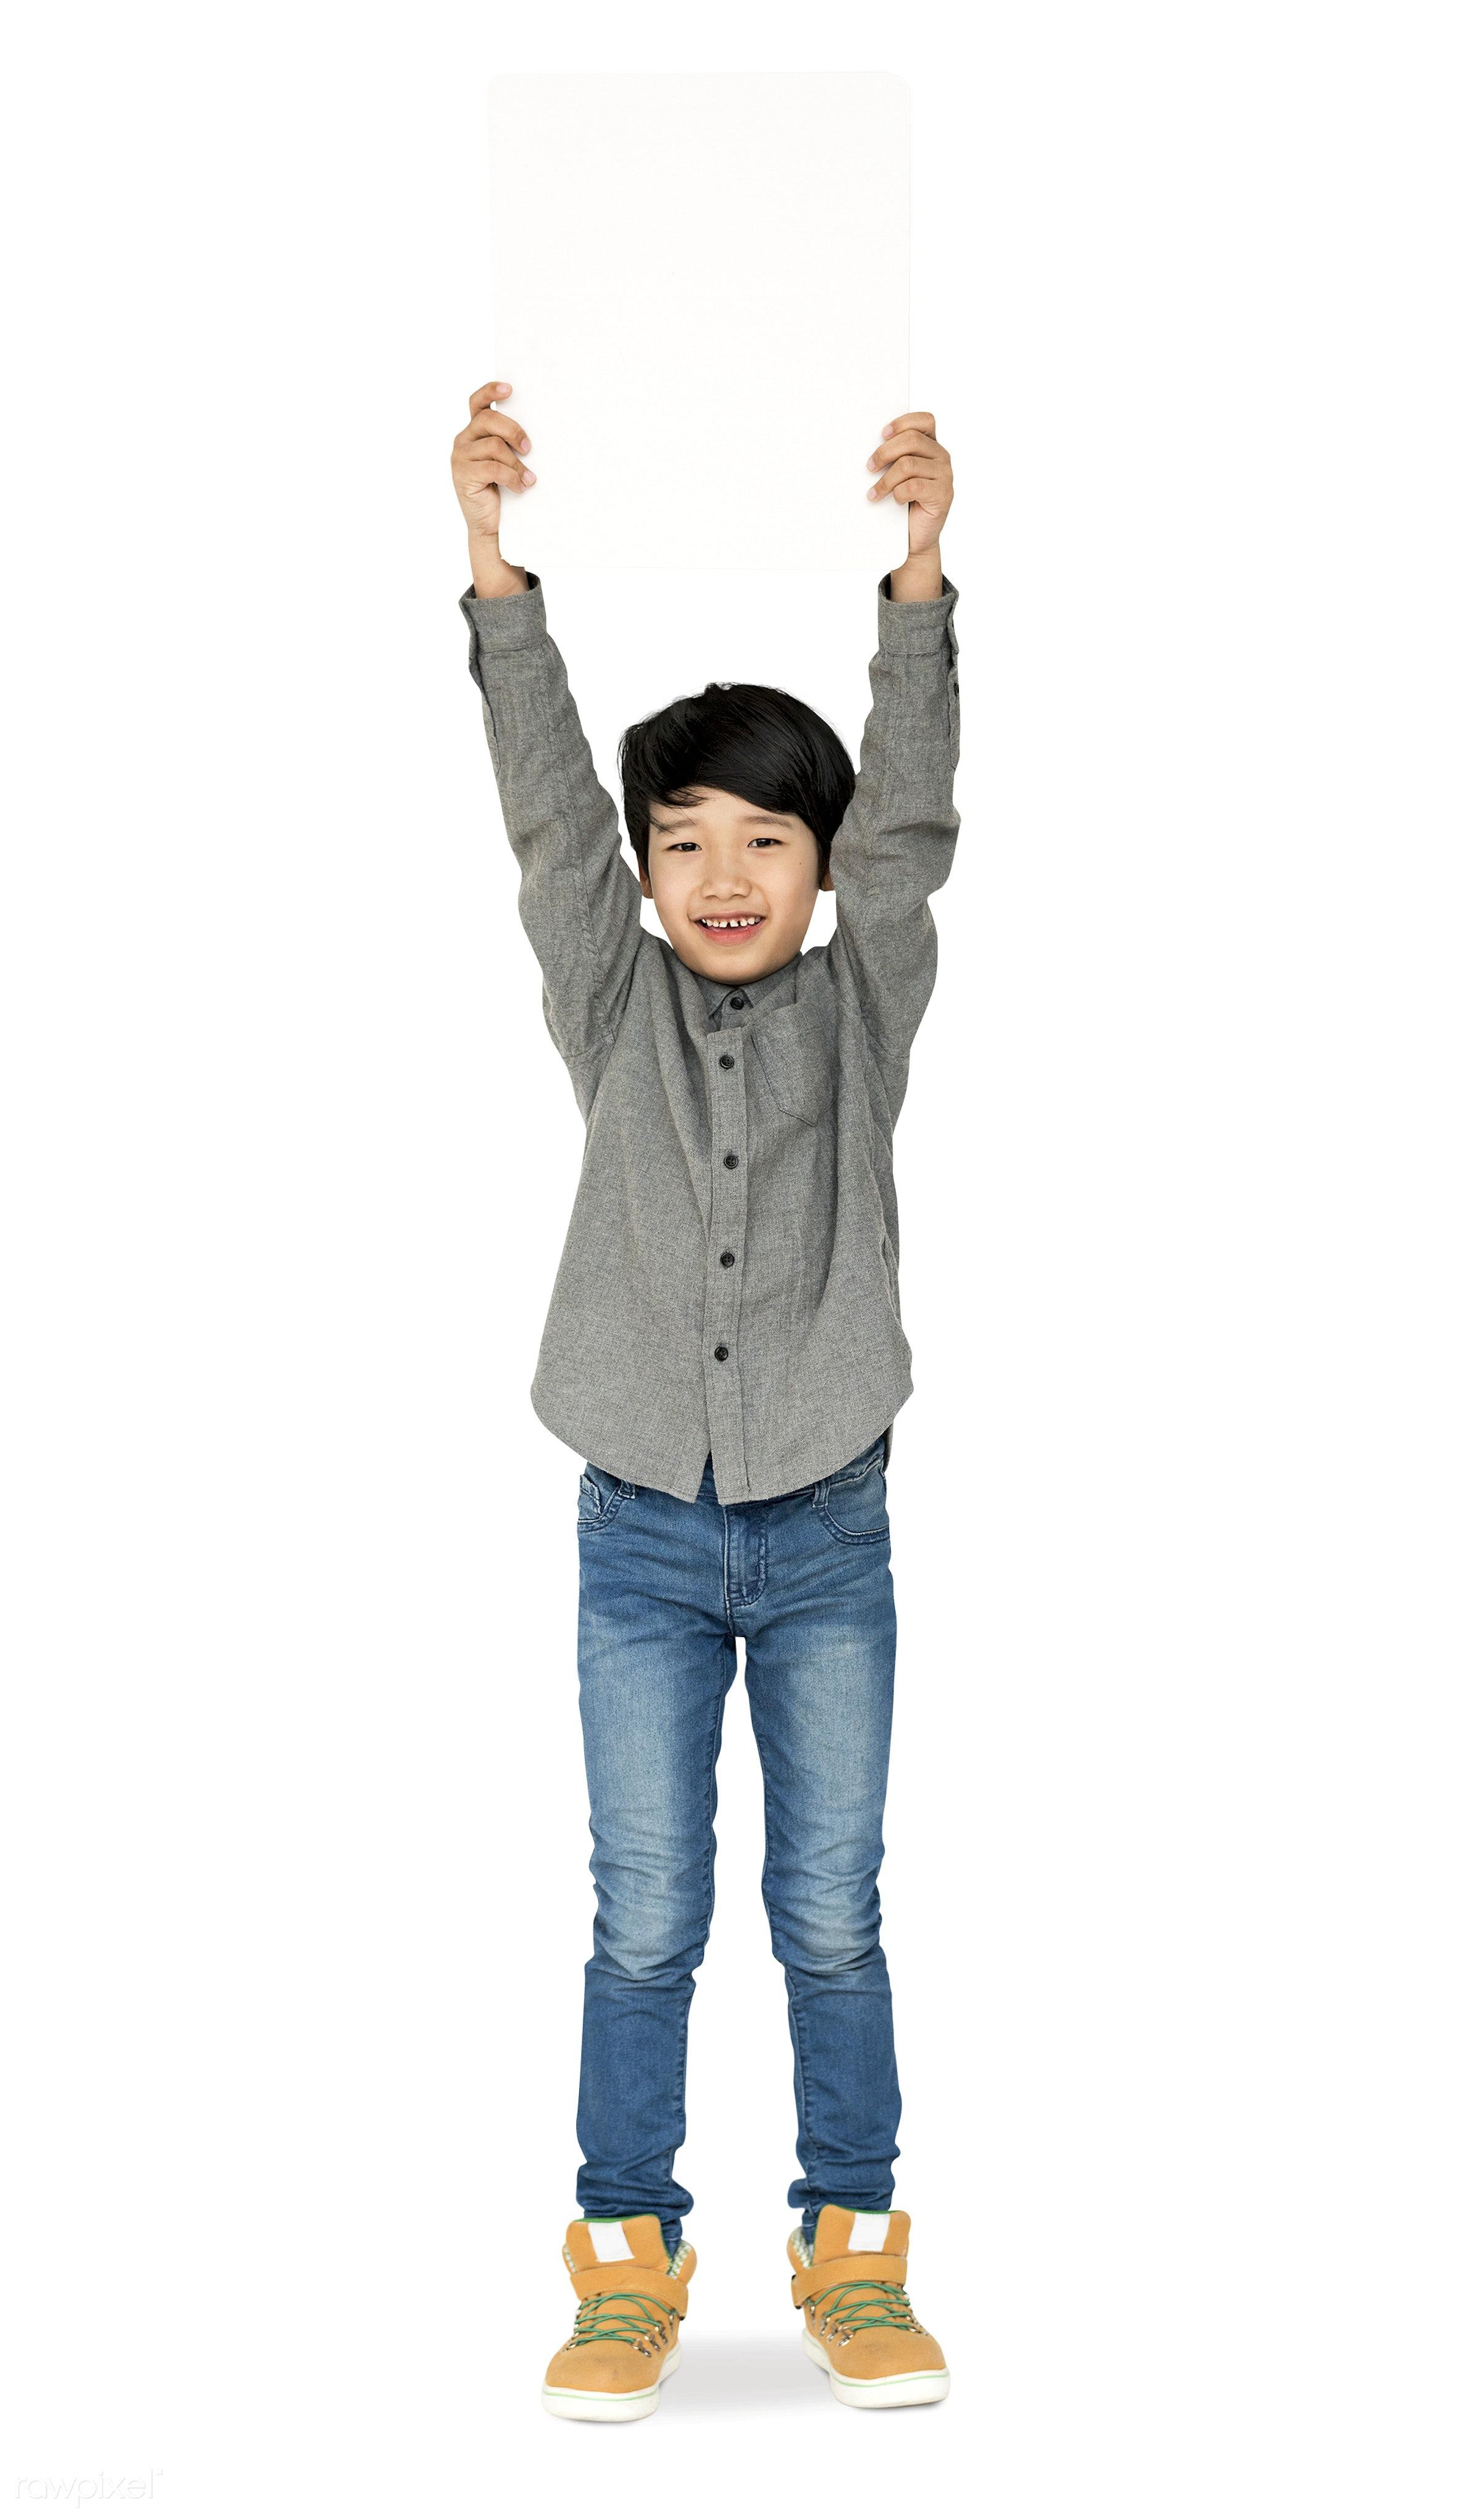 alone, background, blank, boy, boys, cheerful, child, children, confidence, confident, copy space, design space, emotion,...